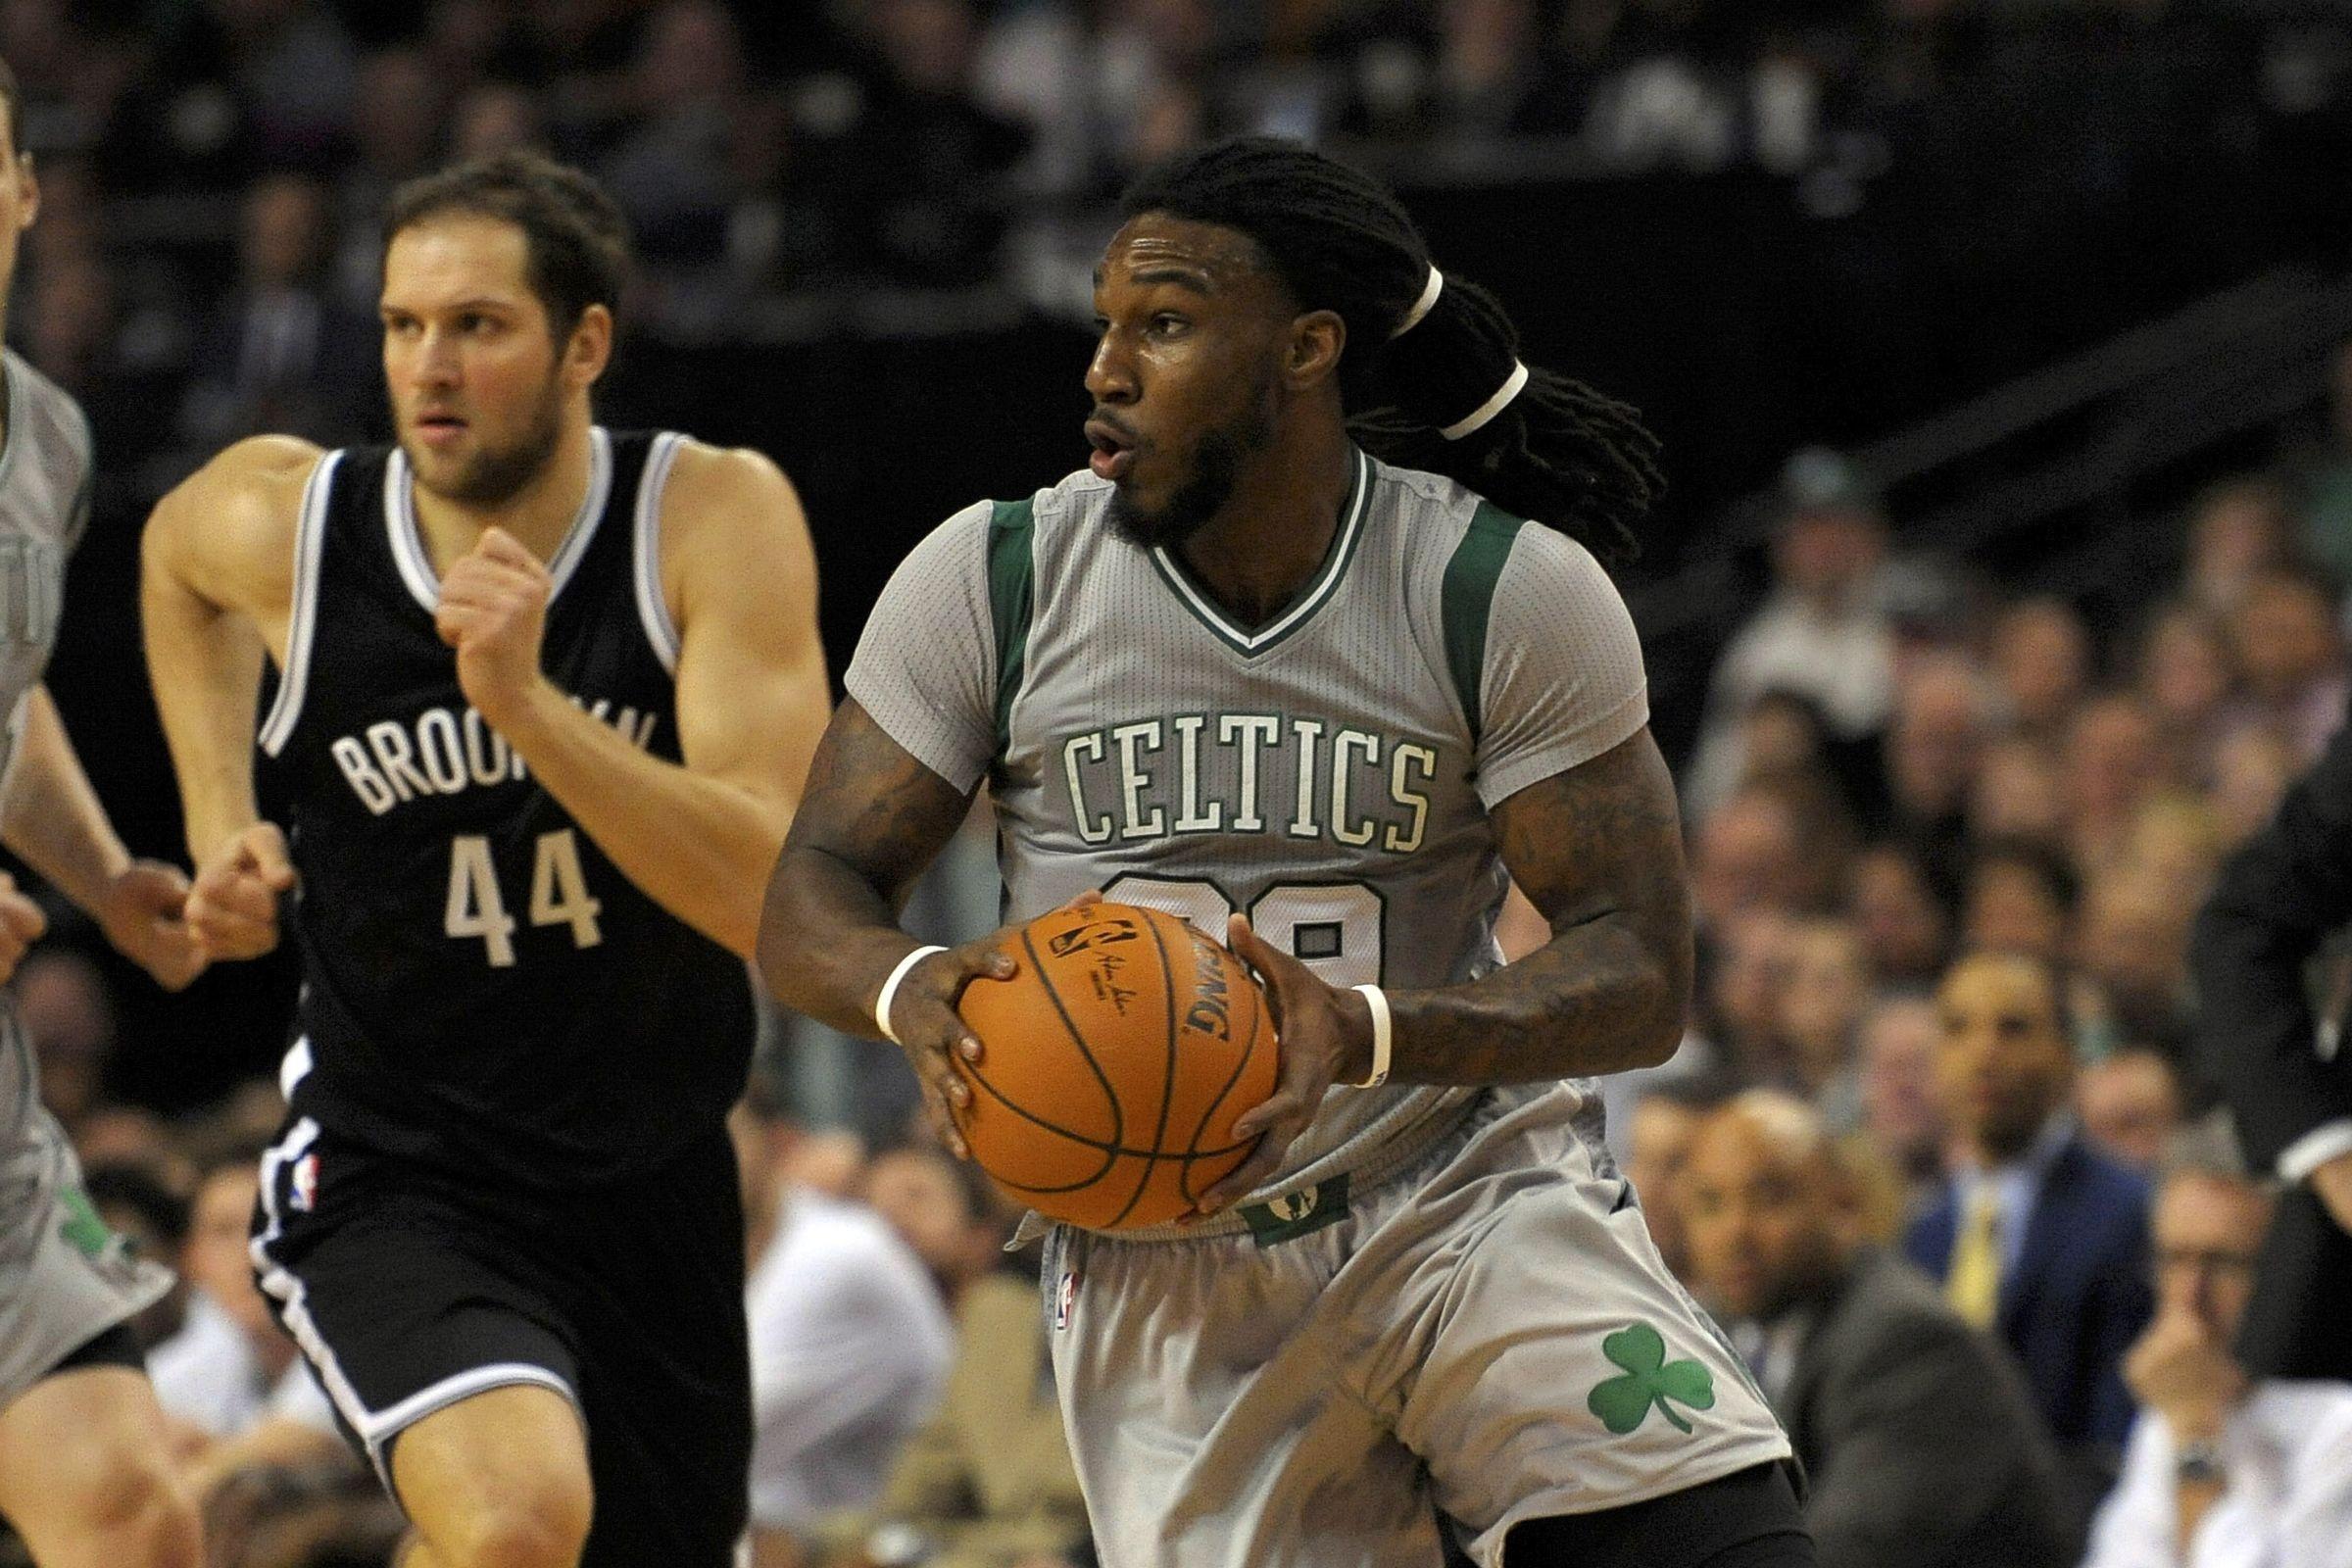 127 Original Celtics Revenge Win Nets